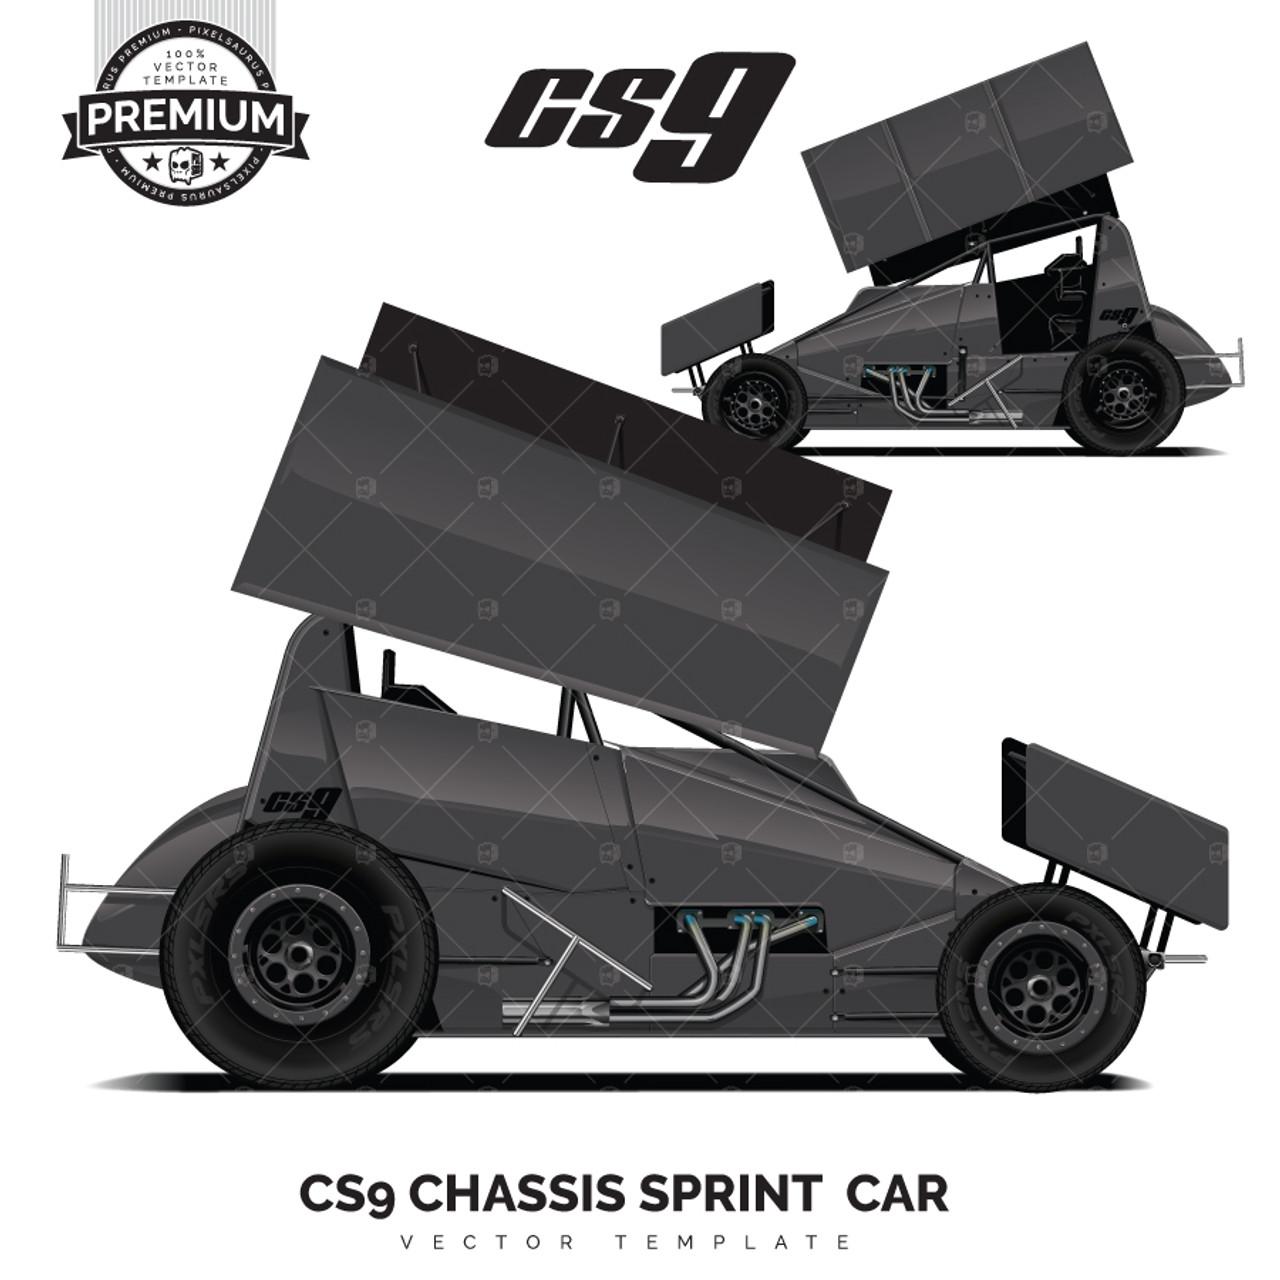 Cs9 Chassis Sprint Car Premium Vector Template